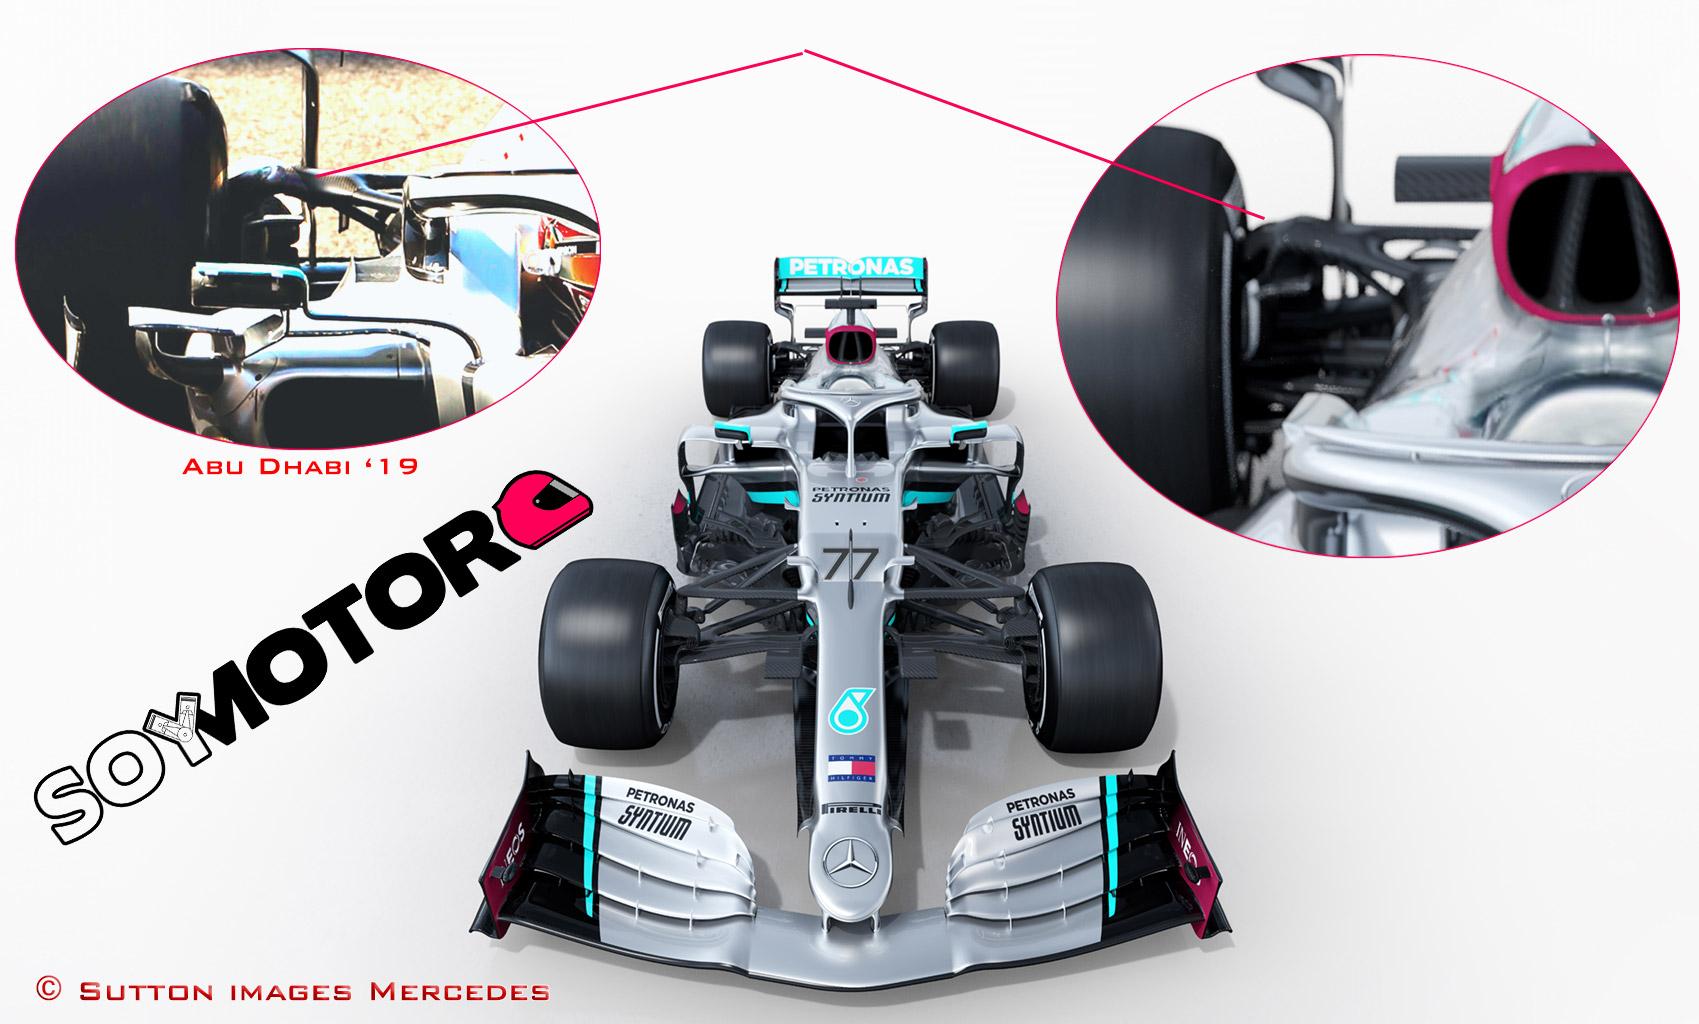 mercedes-suspension-trasera-soymotor.jpg